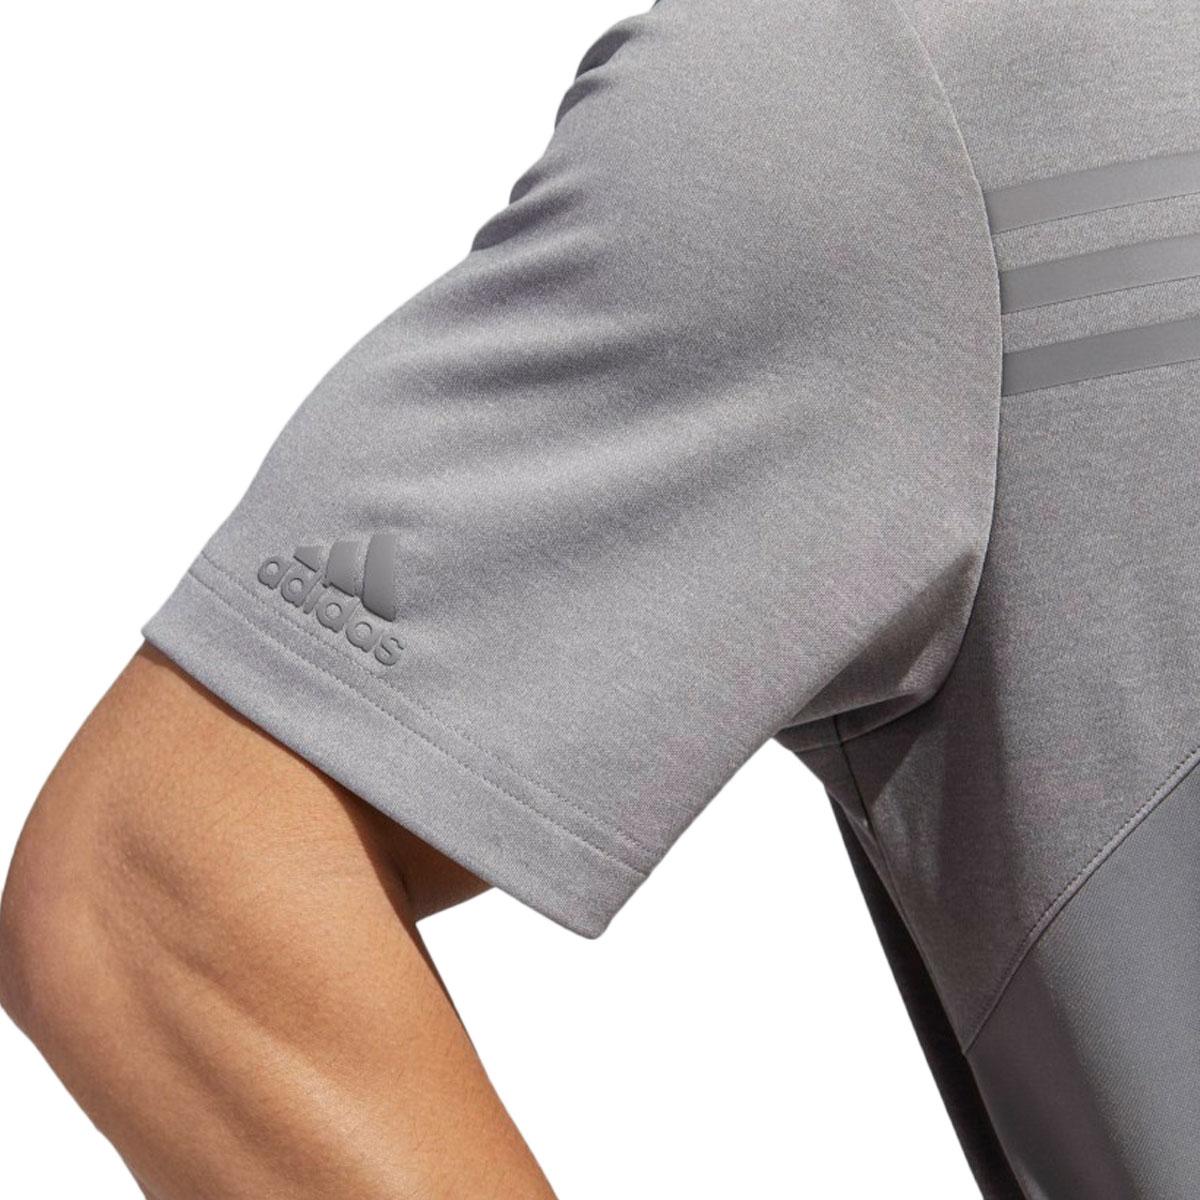 Adidas-Golf-Homme-3-Stripe-Heather-bloque-UPF-50-Polo-Shirt-43-off-RRP miniature 10